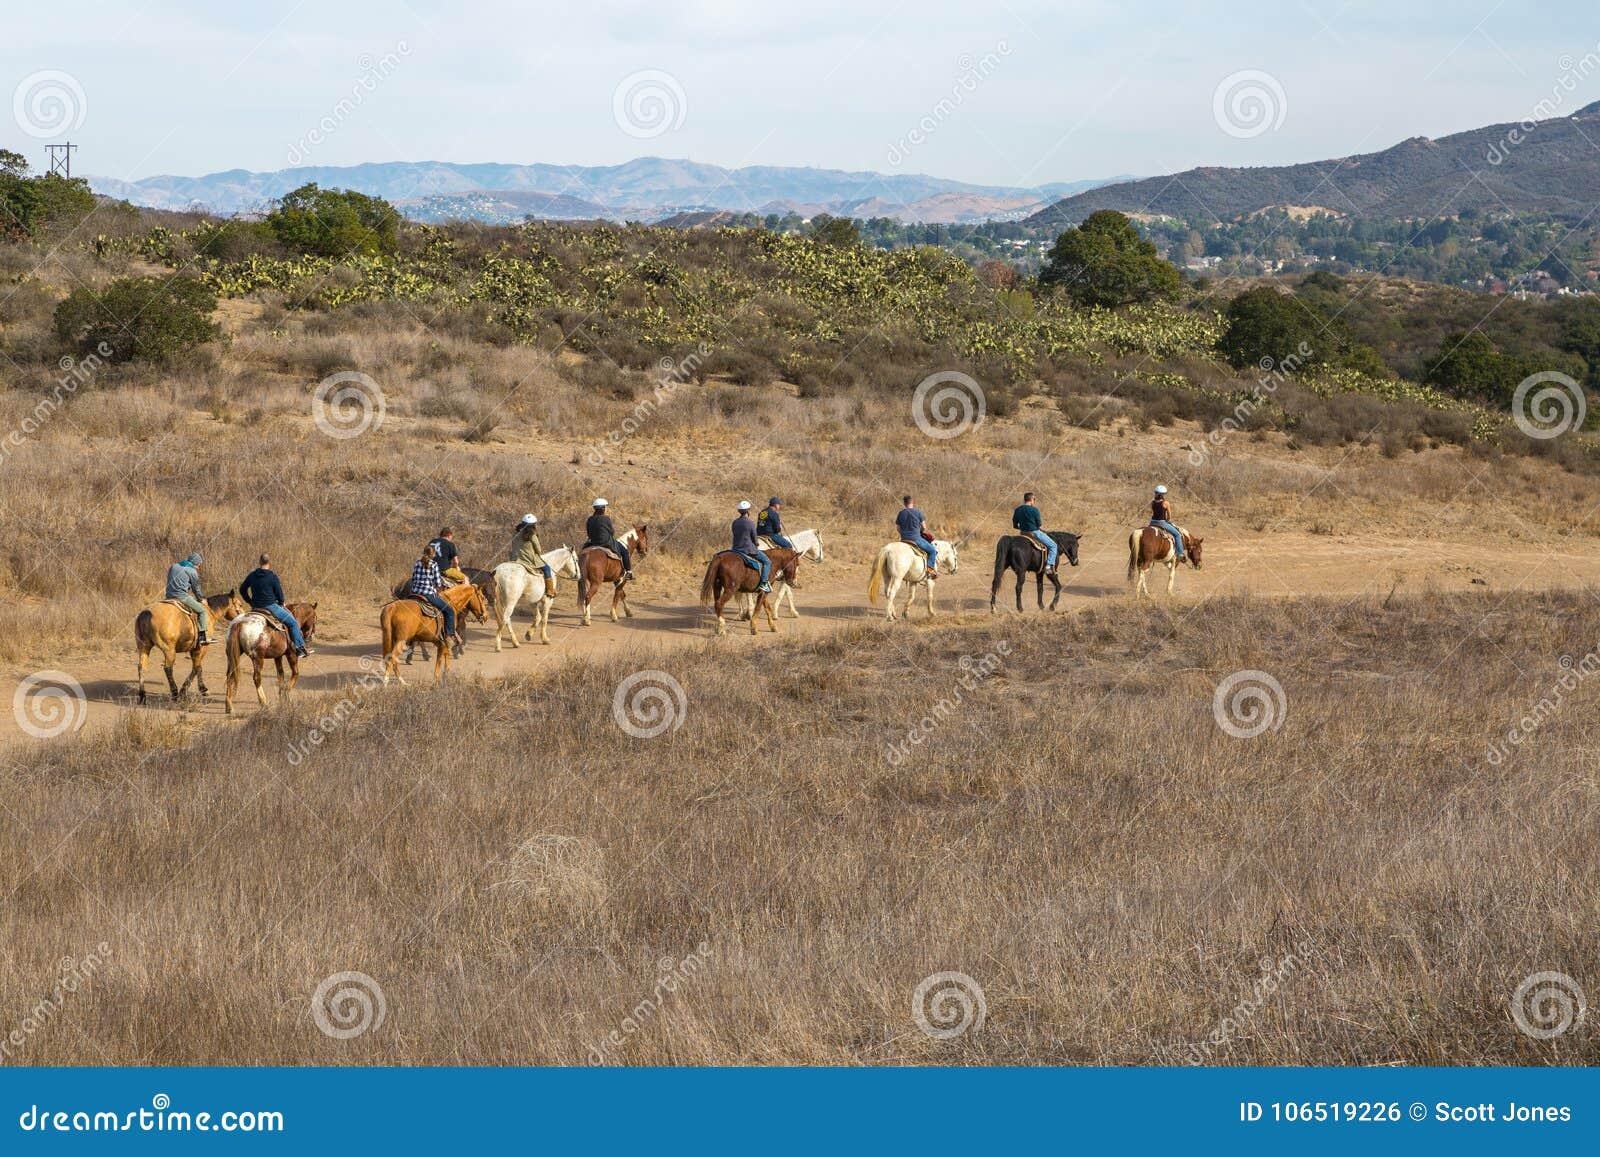 Horseback Riding In Santa Monica Mountains Editorial Photo Image